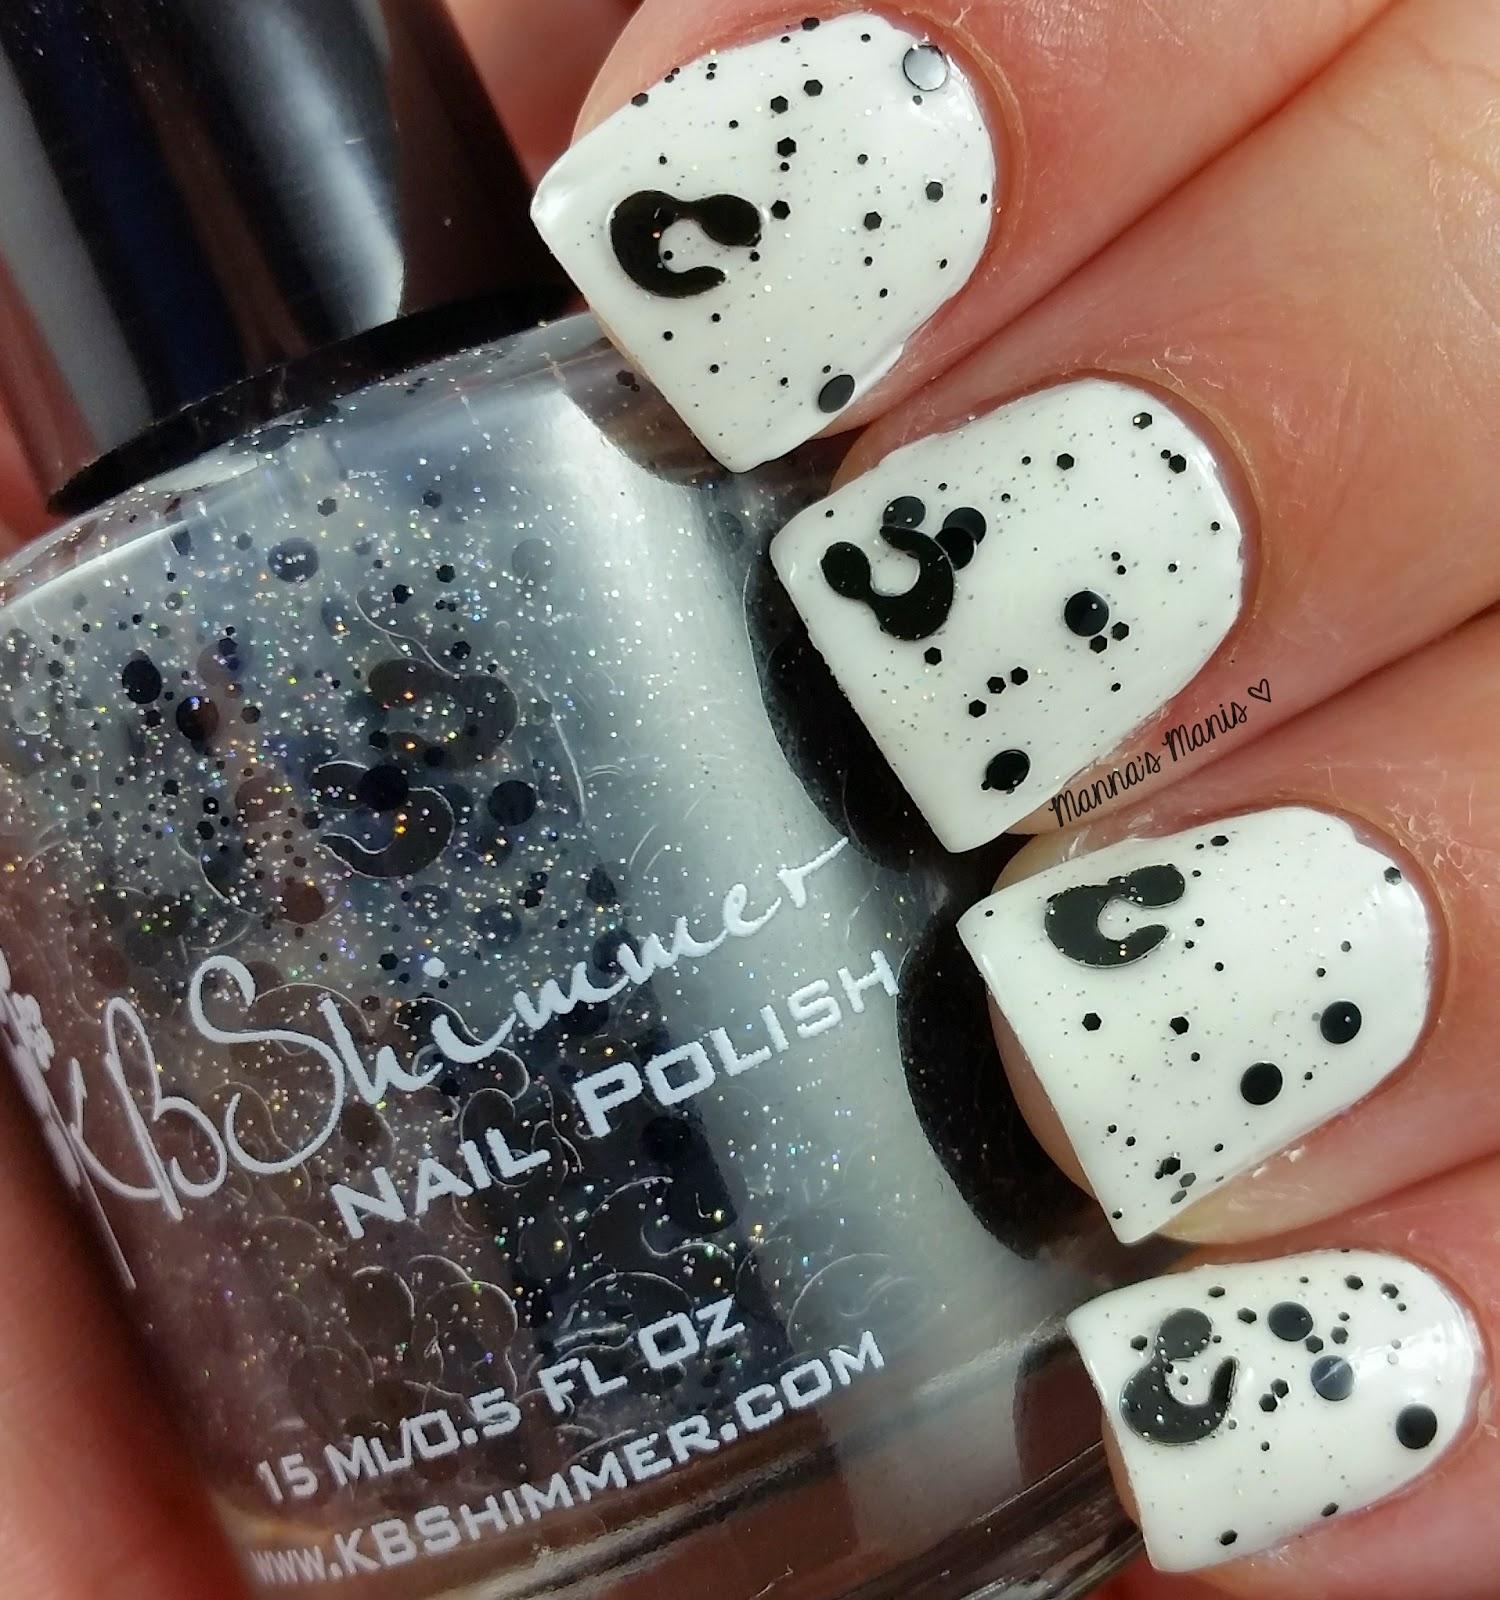 kbshimmer spot sign, a leopard glitter nail polish